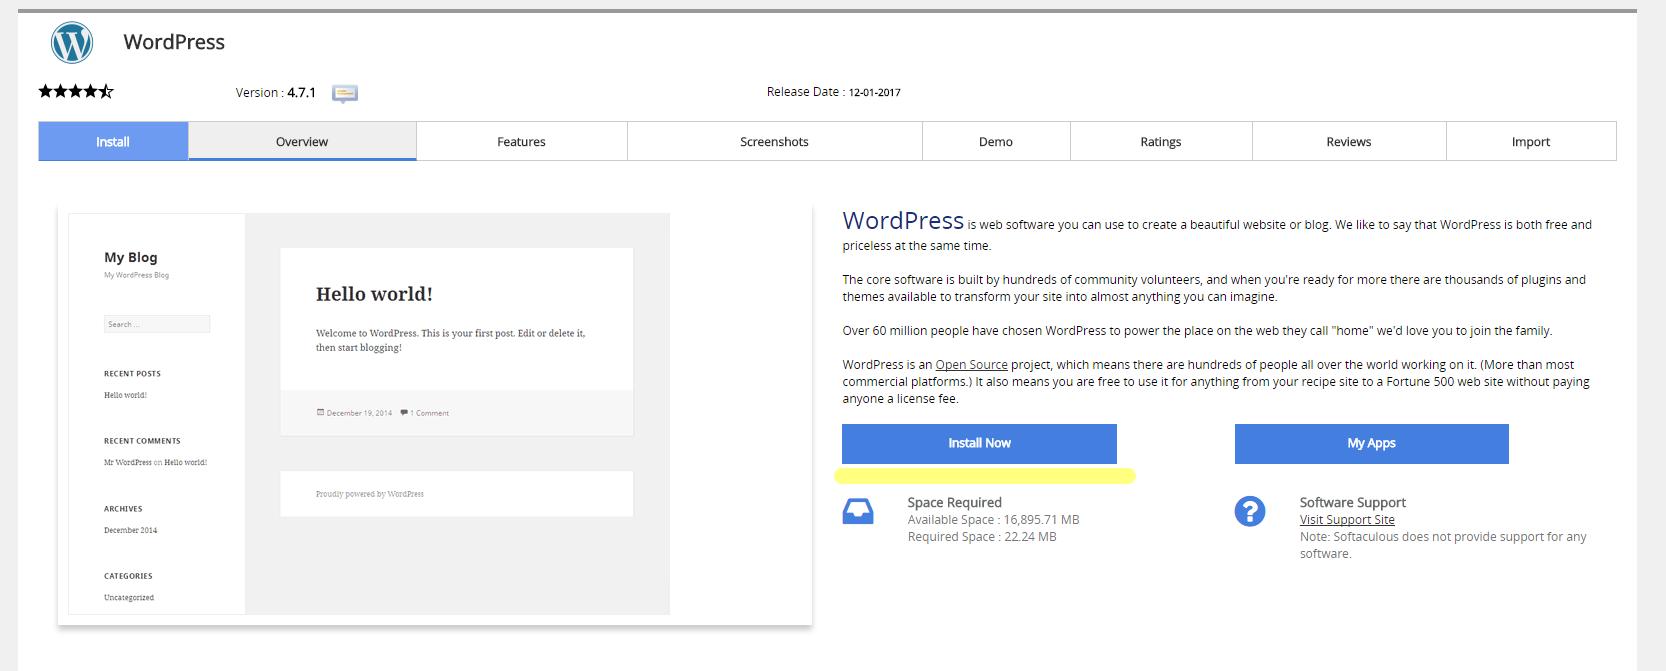 Softaculous WordPress Main Info Page